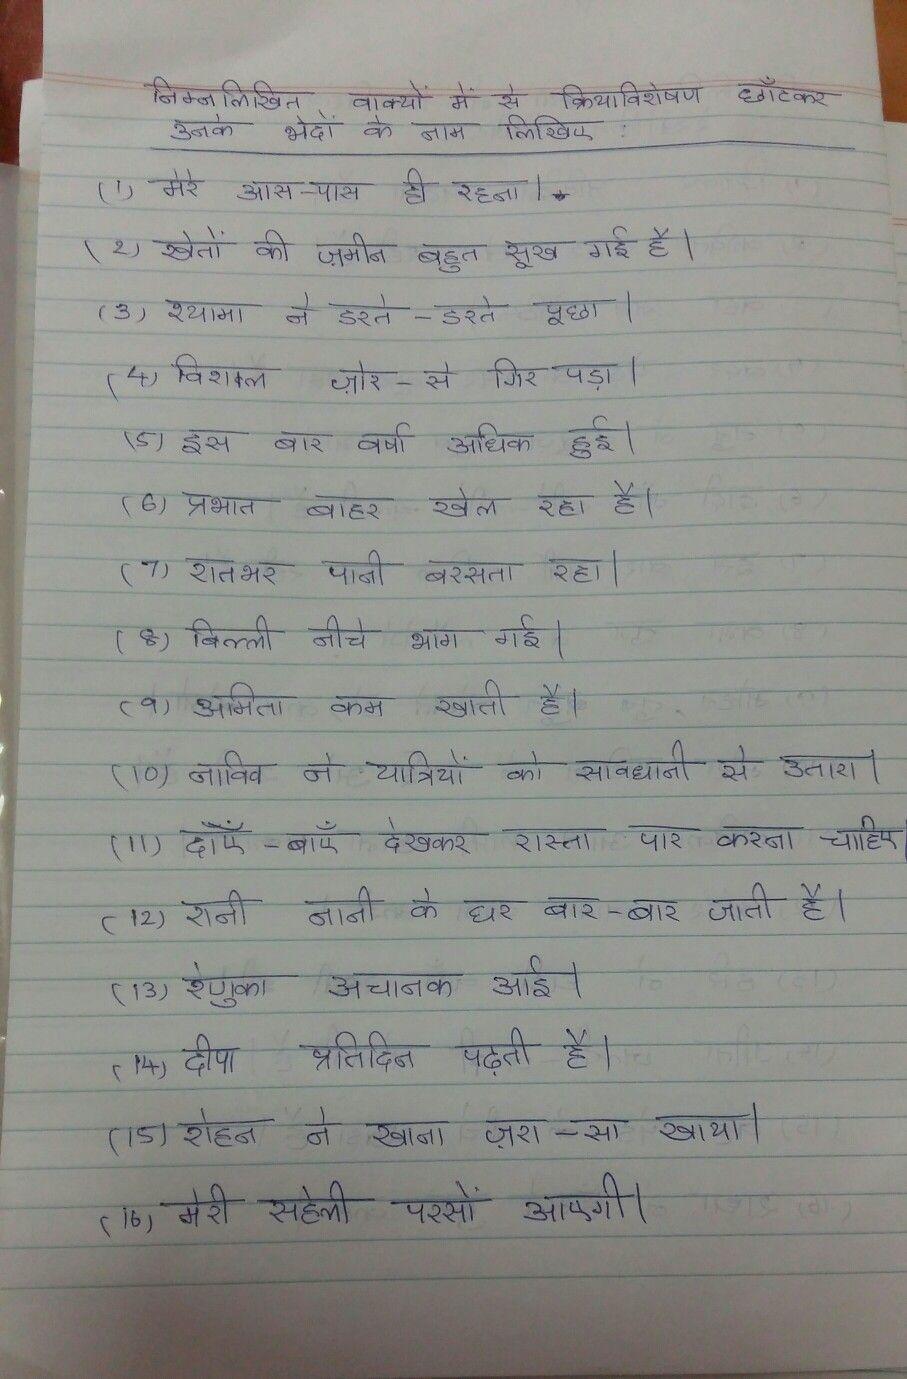 Hindi grammar Kriyavisheshan 1 | worksheets for school kids ...